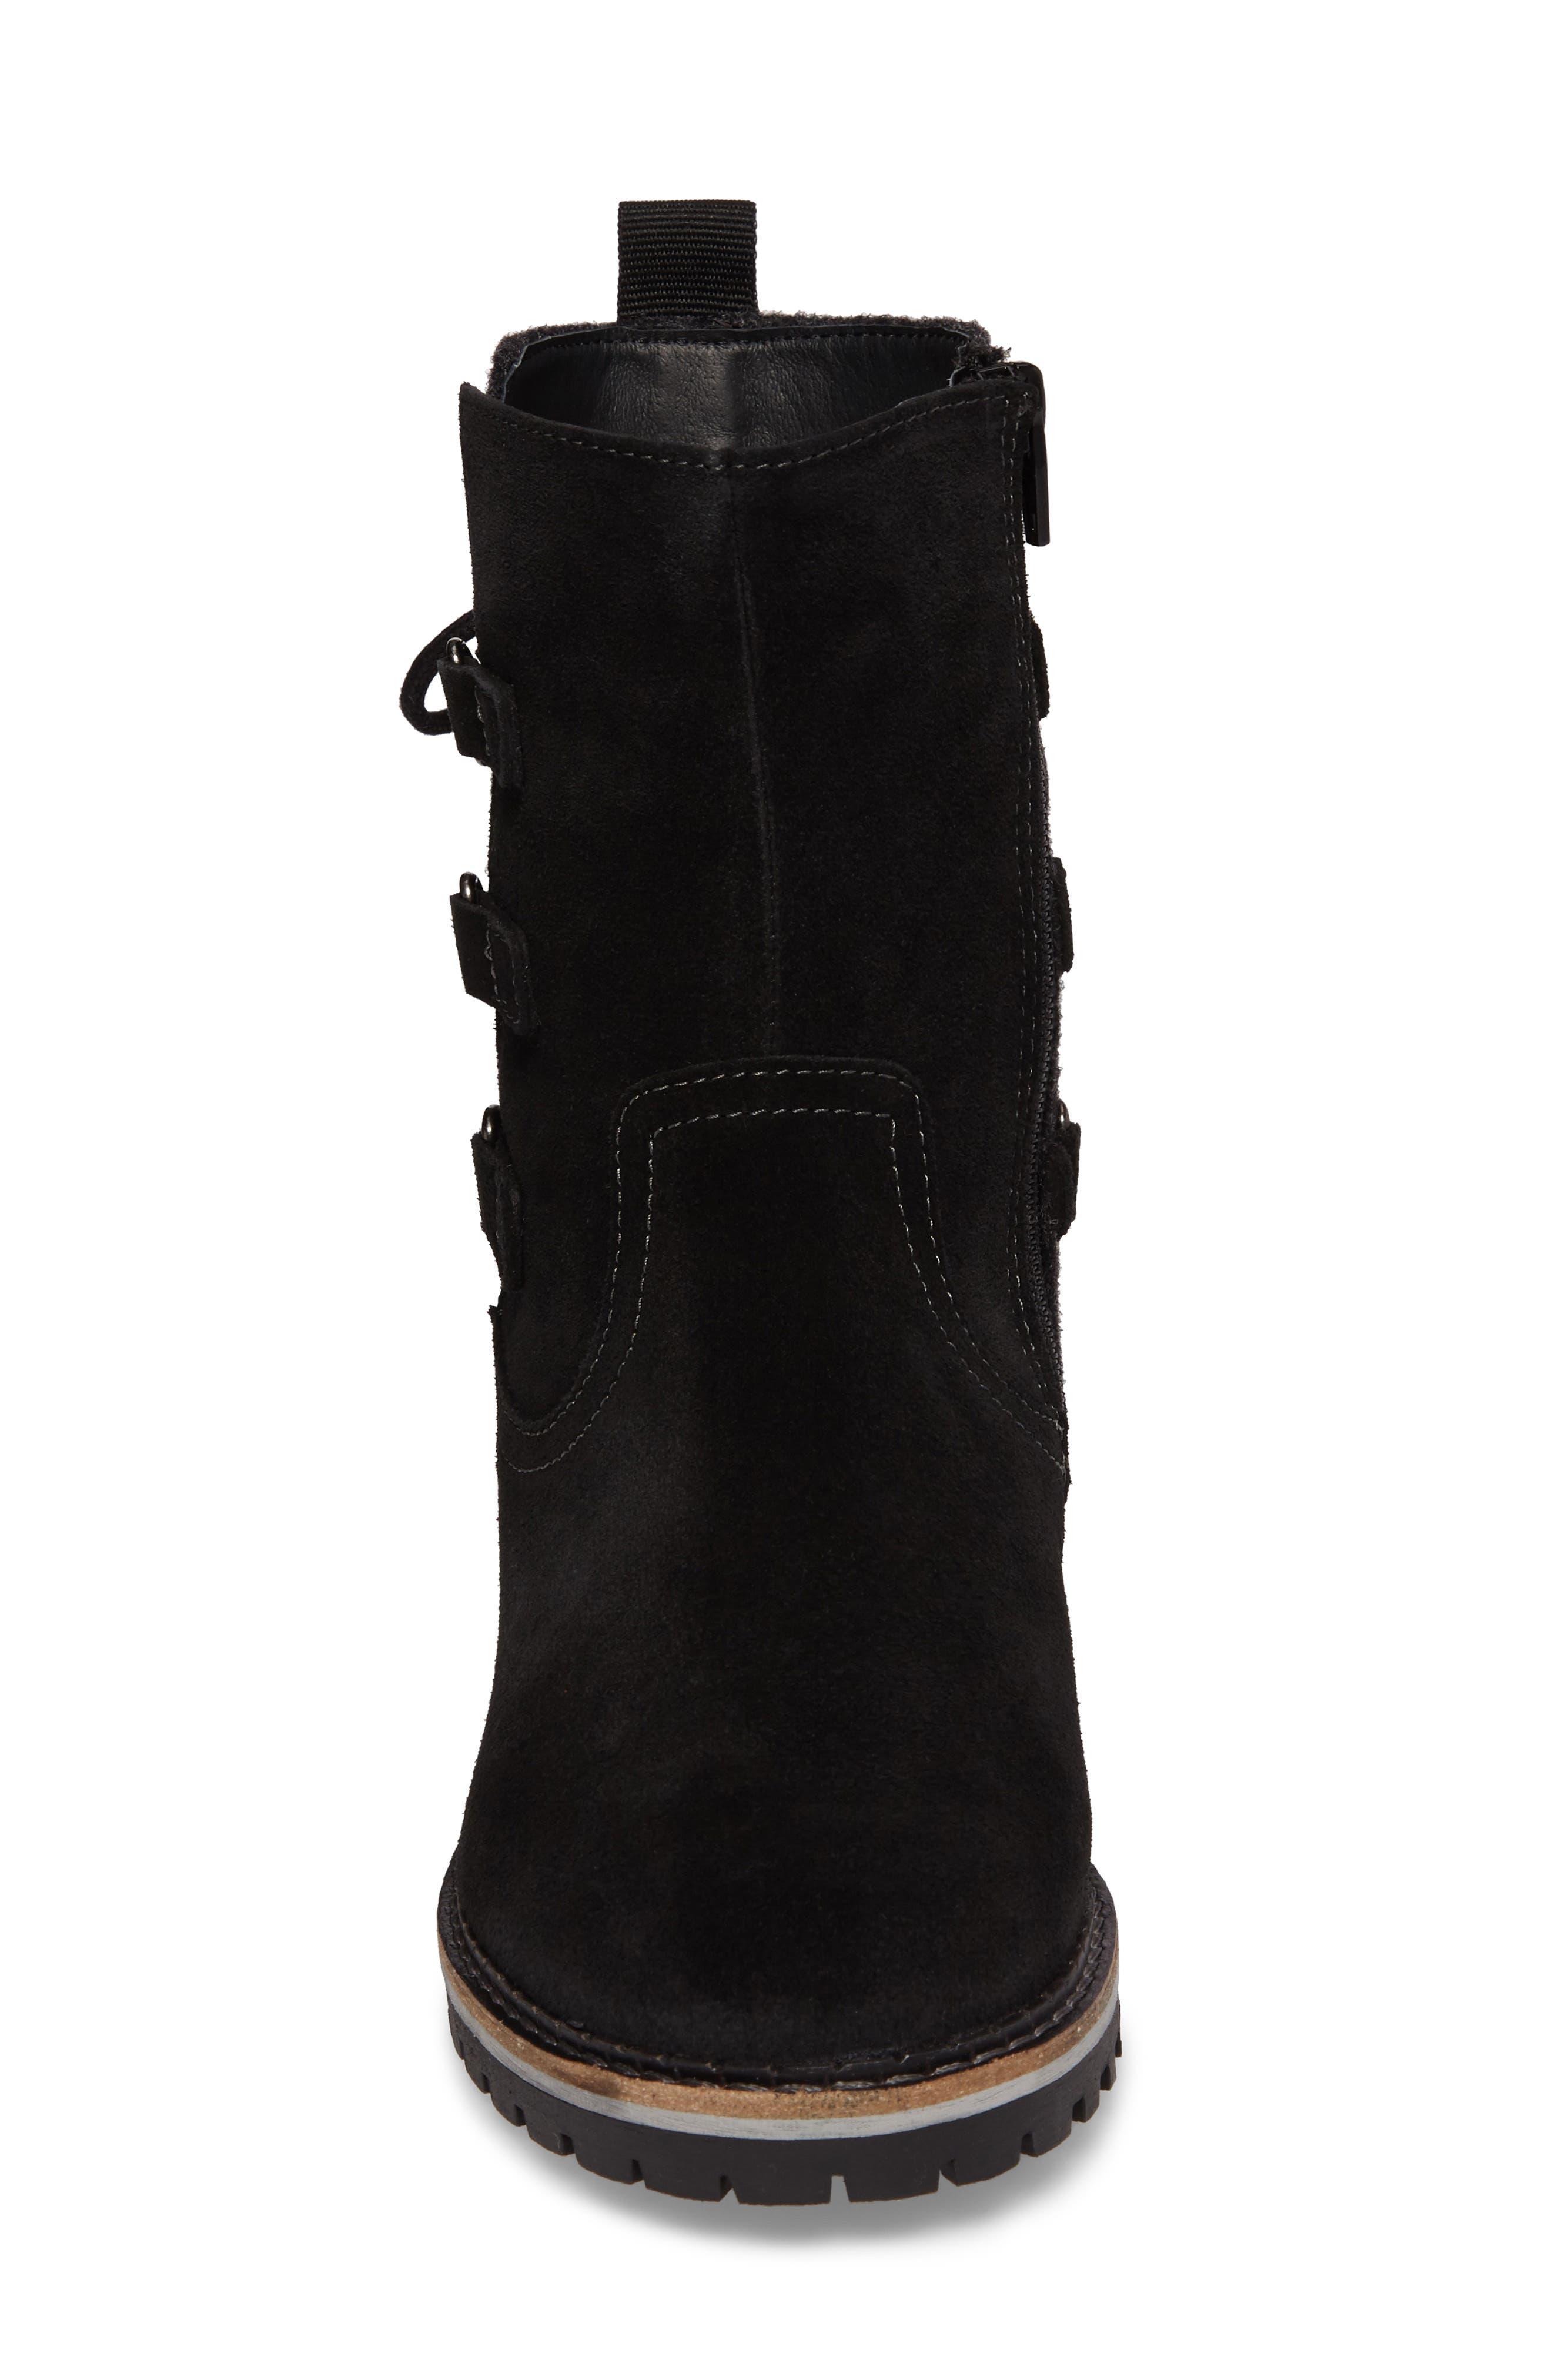 Cascade Waterproof Boot,                             Alternate thumbnail 4, color,                             Black/ Grey Suede